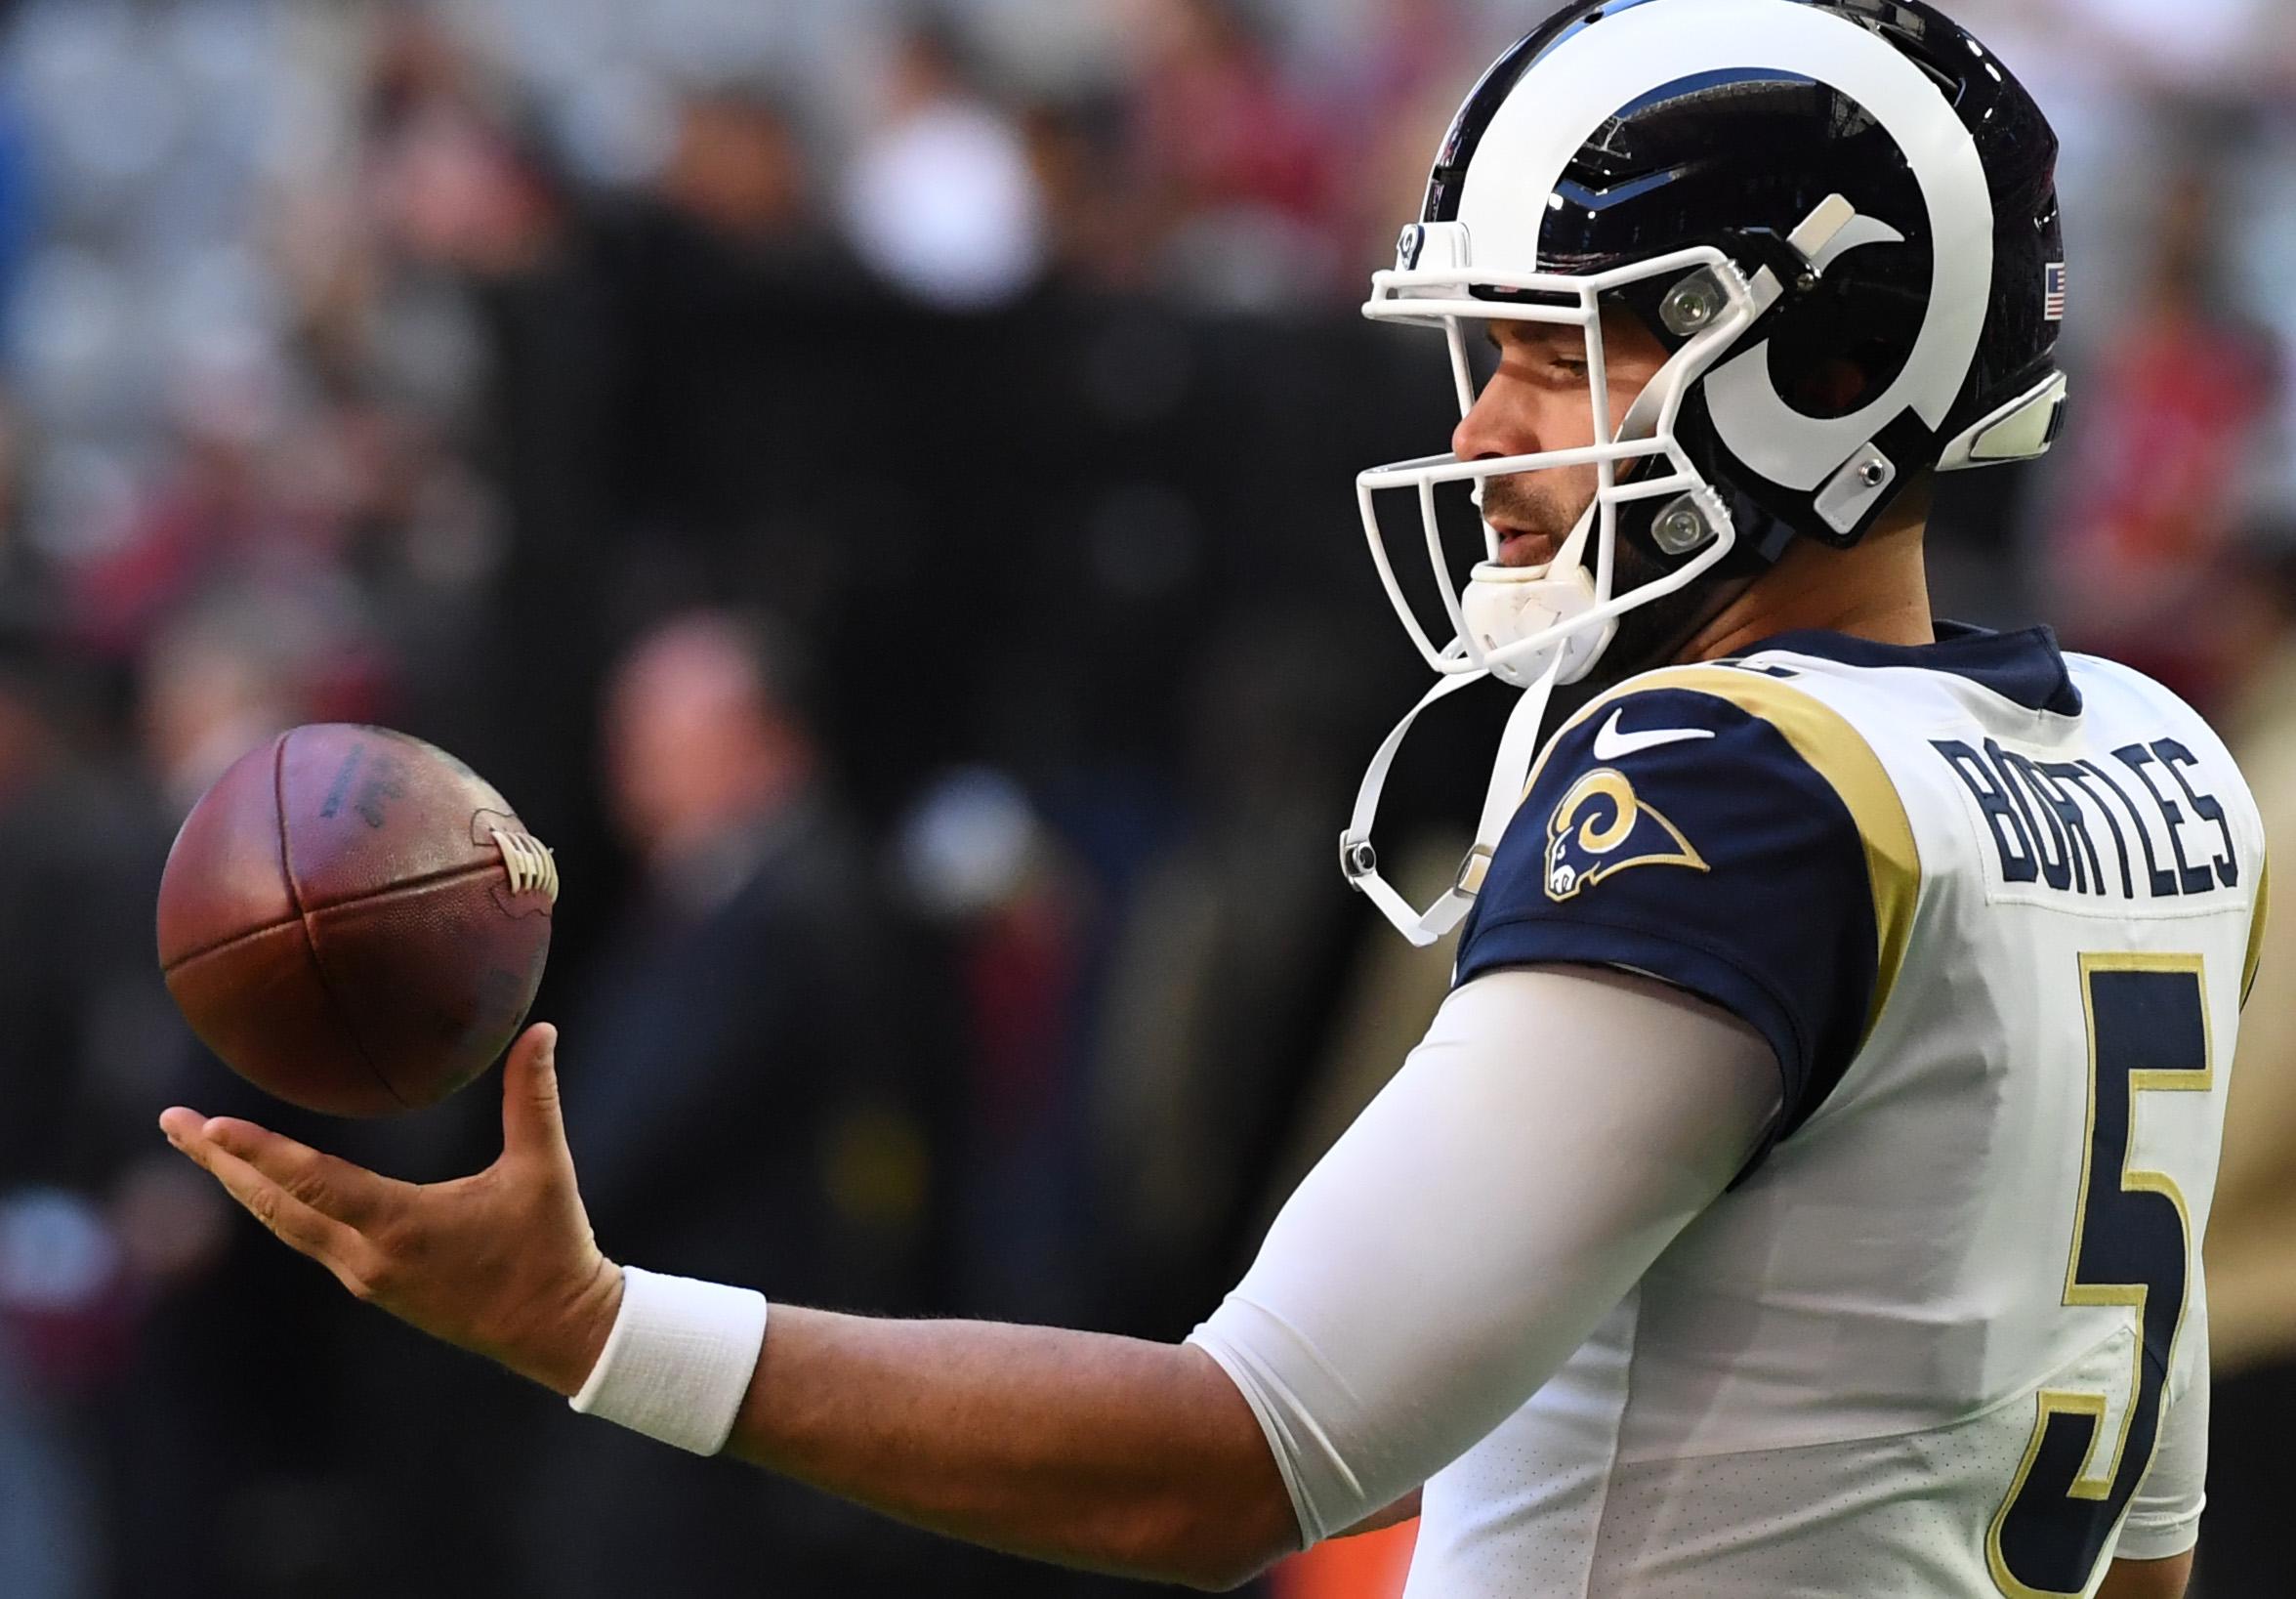 Denver Broncos quarterback Blake Bortles, seen with the Jacksonville Jaguars last year, is something of a Beyonce fan, put lightly.